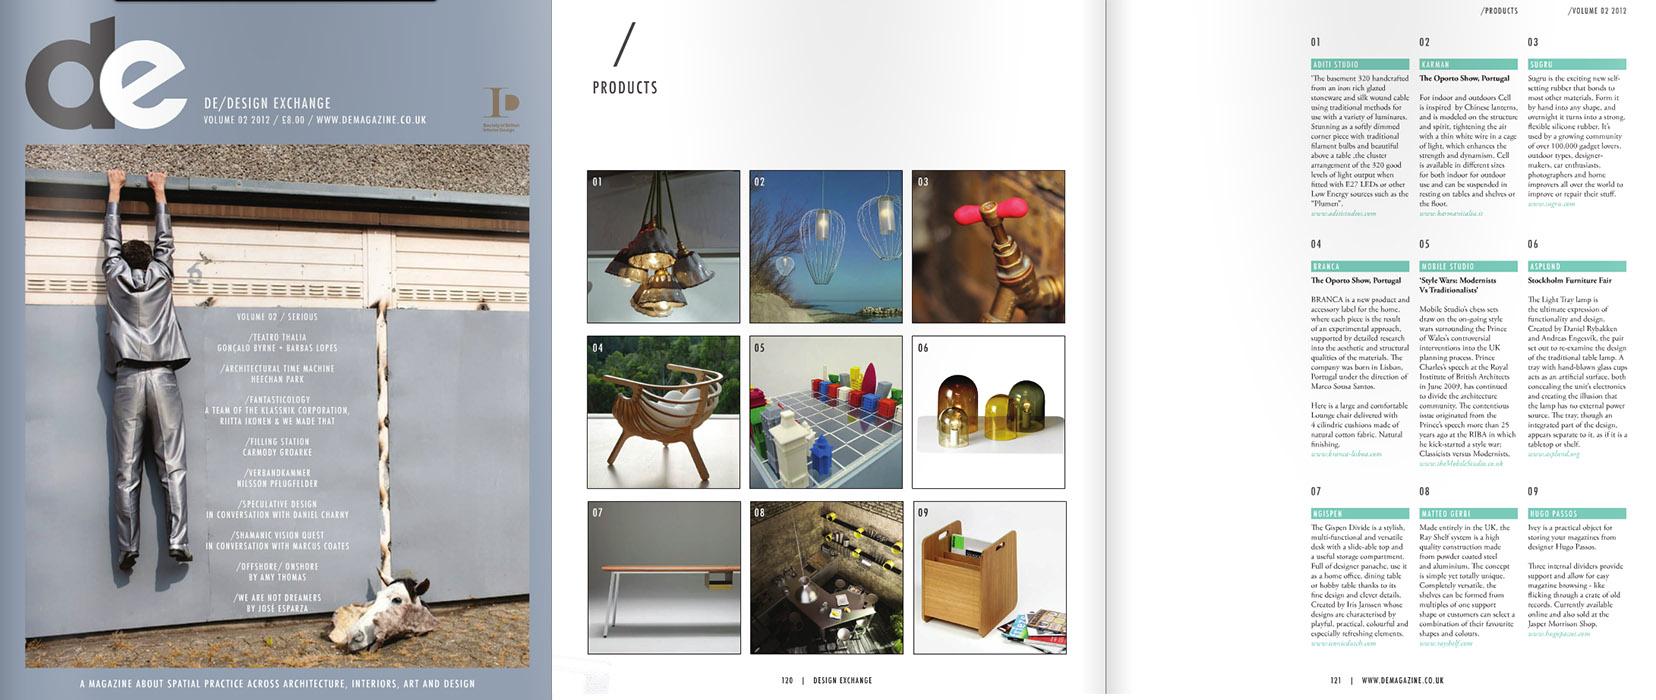 08-DesignExchangeMagazine-September2012-small.jpg